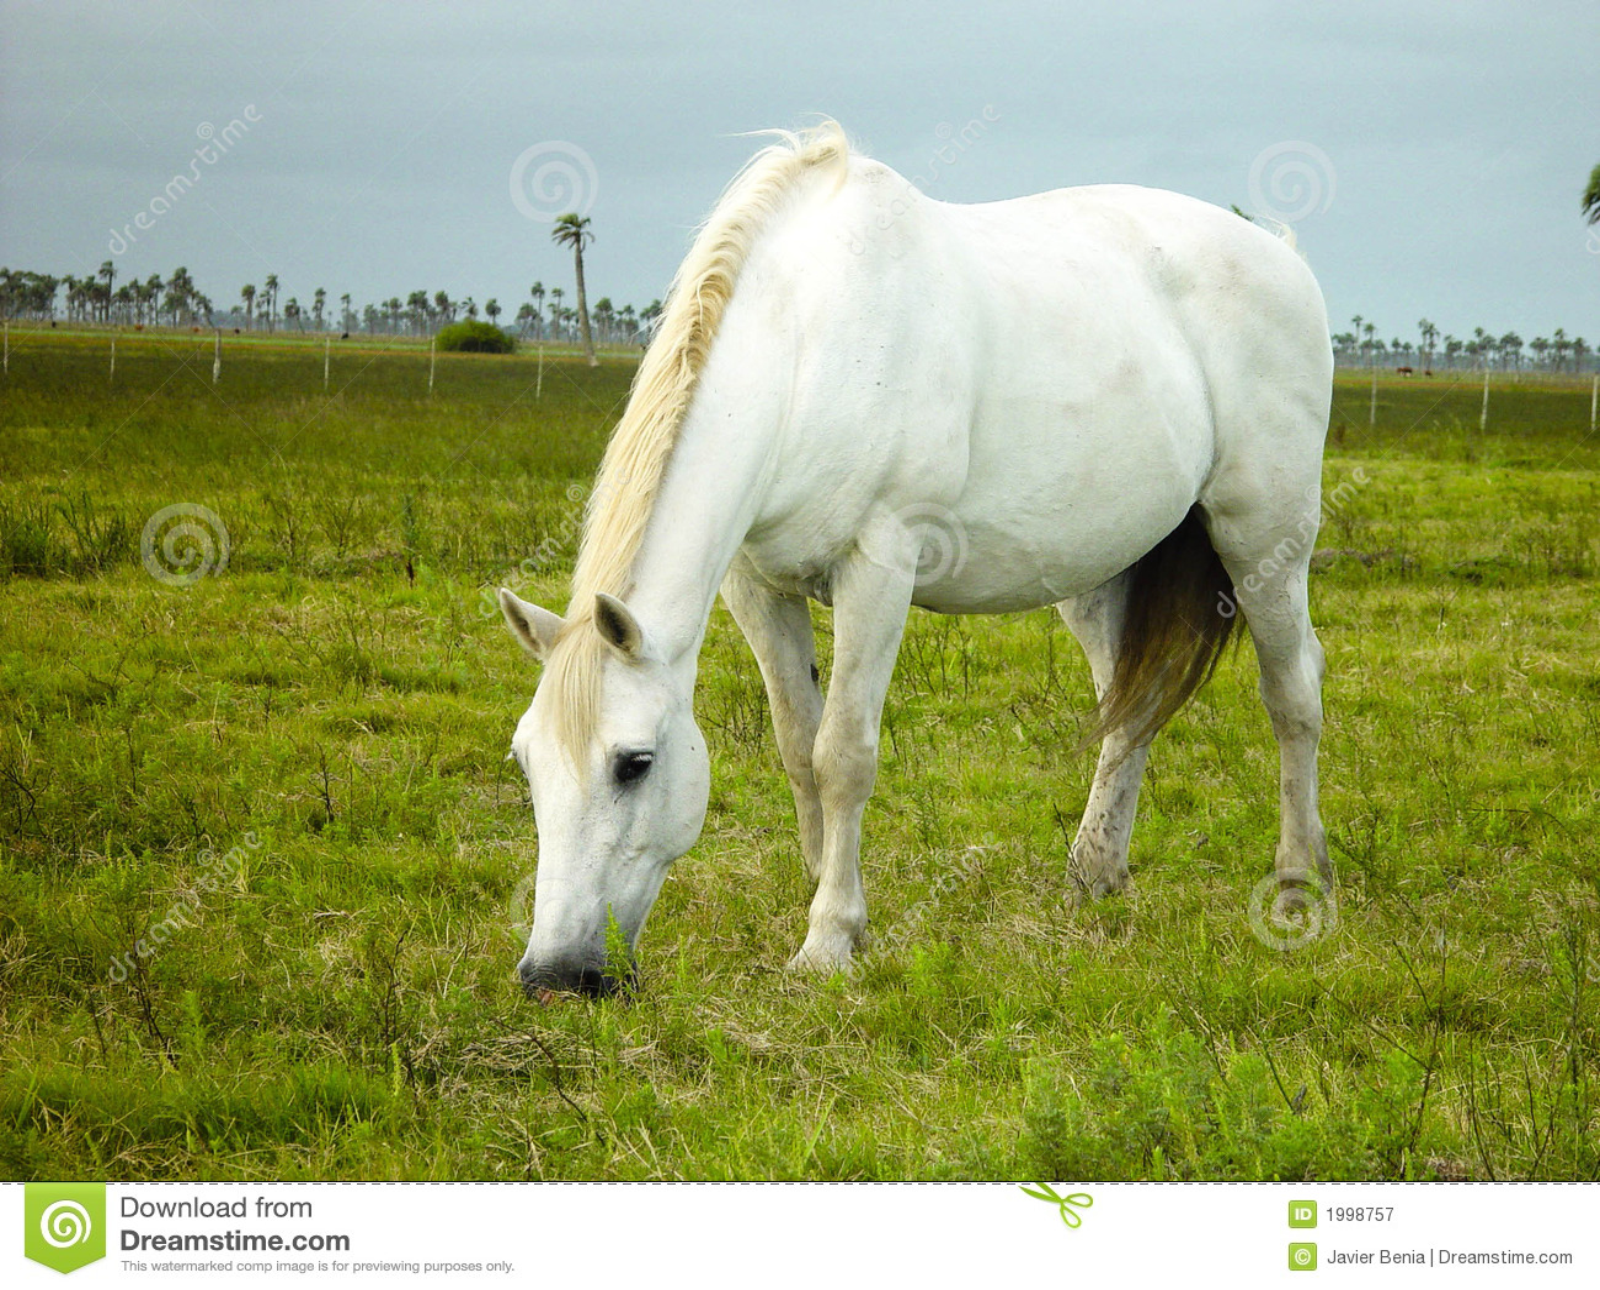 White horse eating grass - photo#1